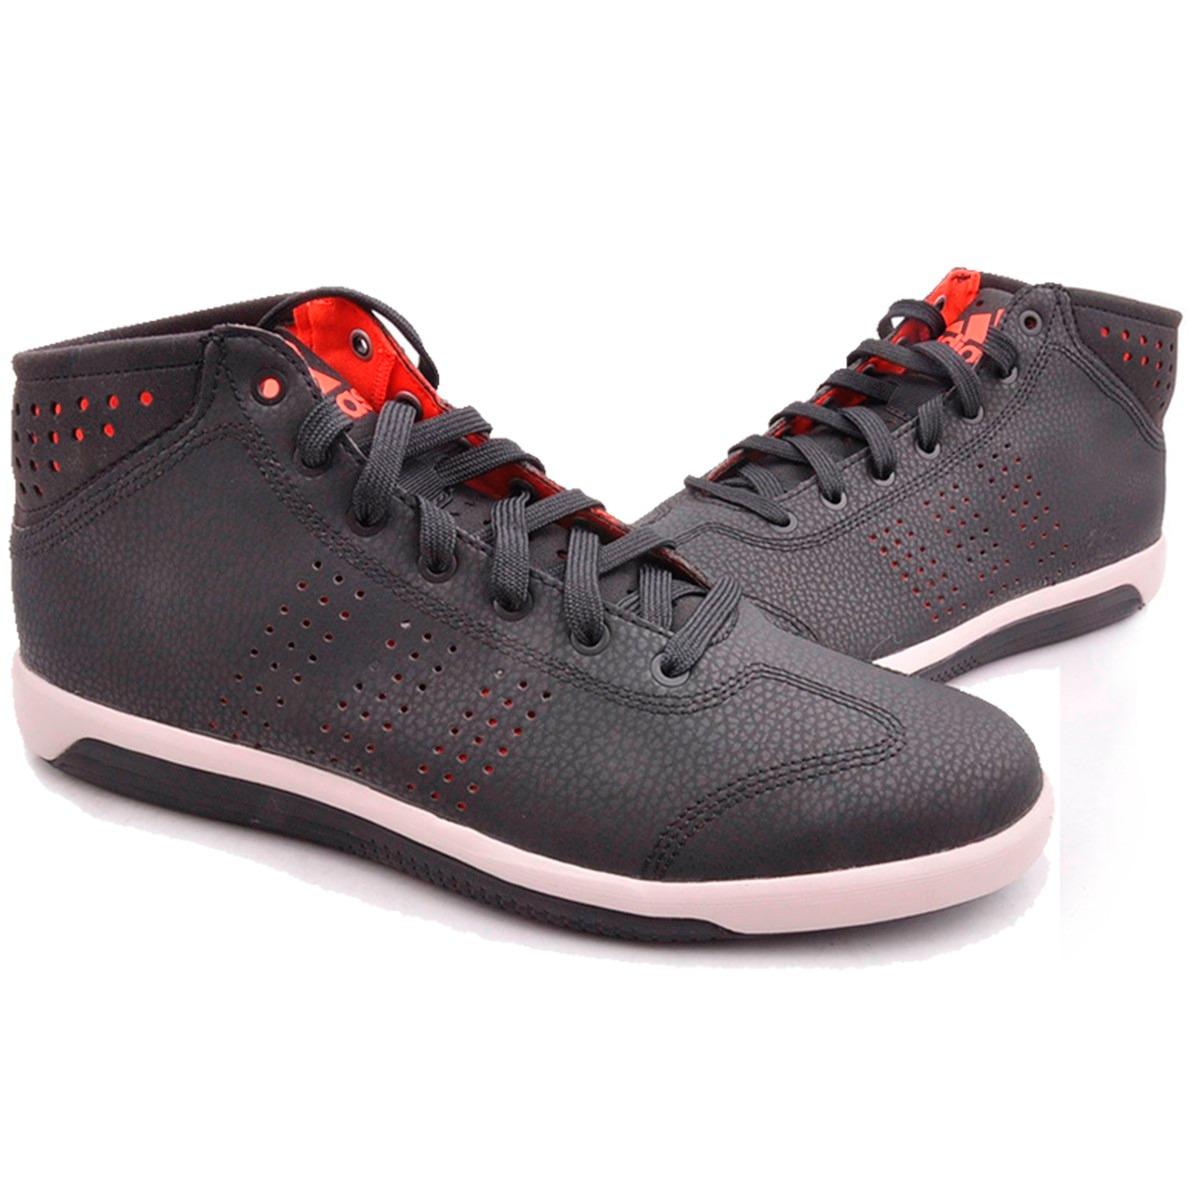 champión bota calzado adidas Cargando mid zoom universal ZrZx8qwTB ... 2bffaf097efda